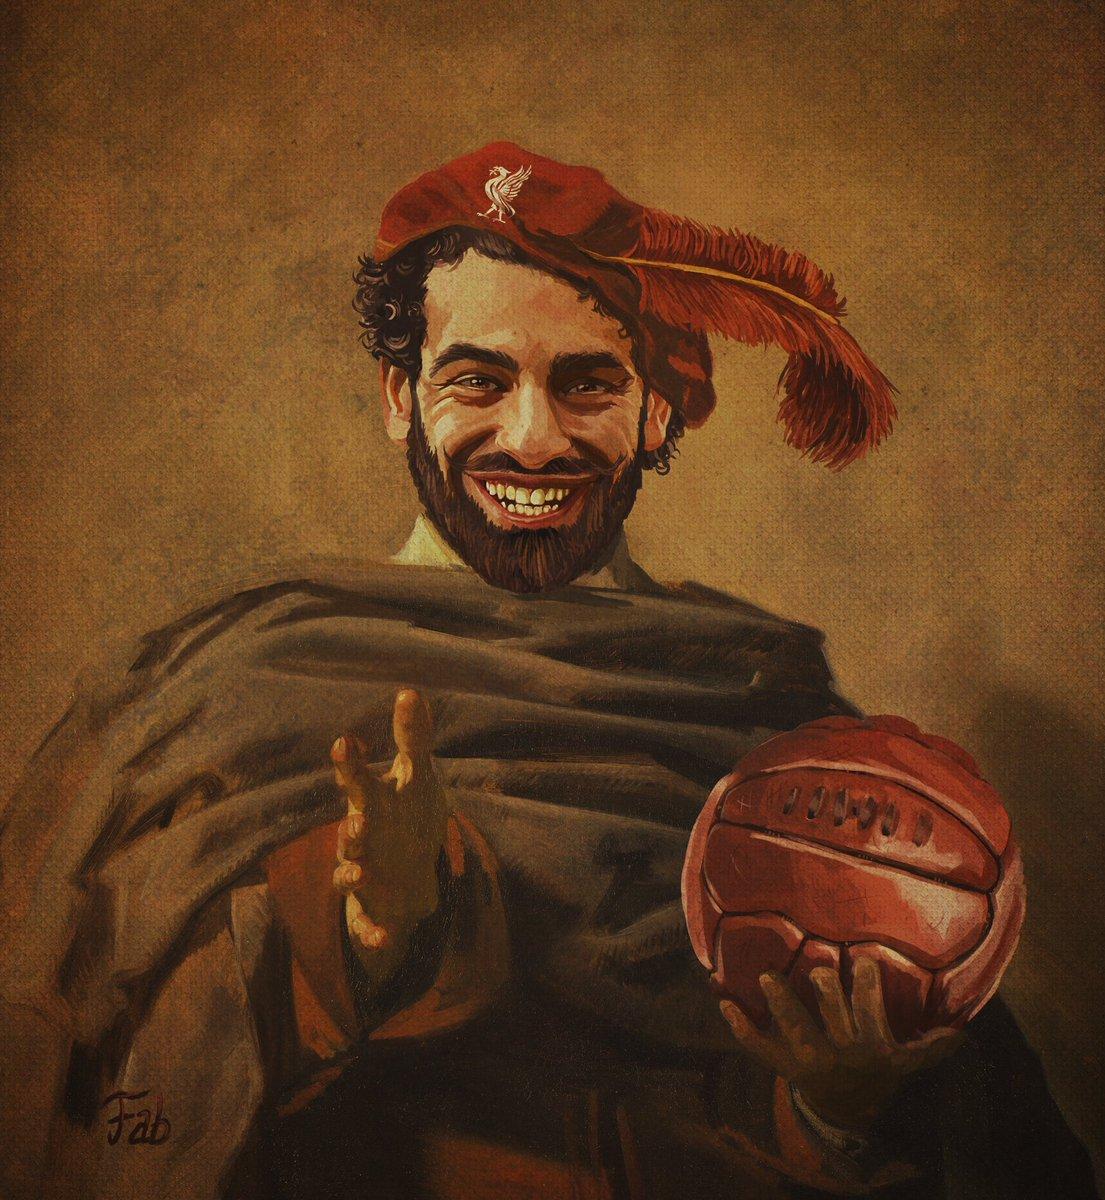 When art meets Football. Joyful Mo Salah after his hat trick, Unknown Rembrandt's school circa 1660. #momosalah #ynwa #lfc #egypt #footballart https://t.co/psIarEZkFR